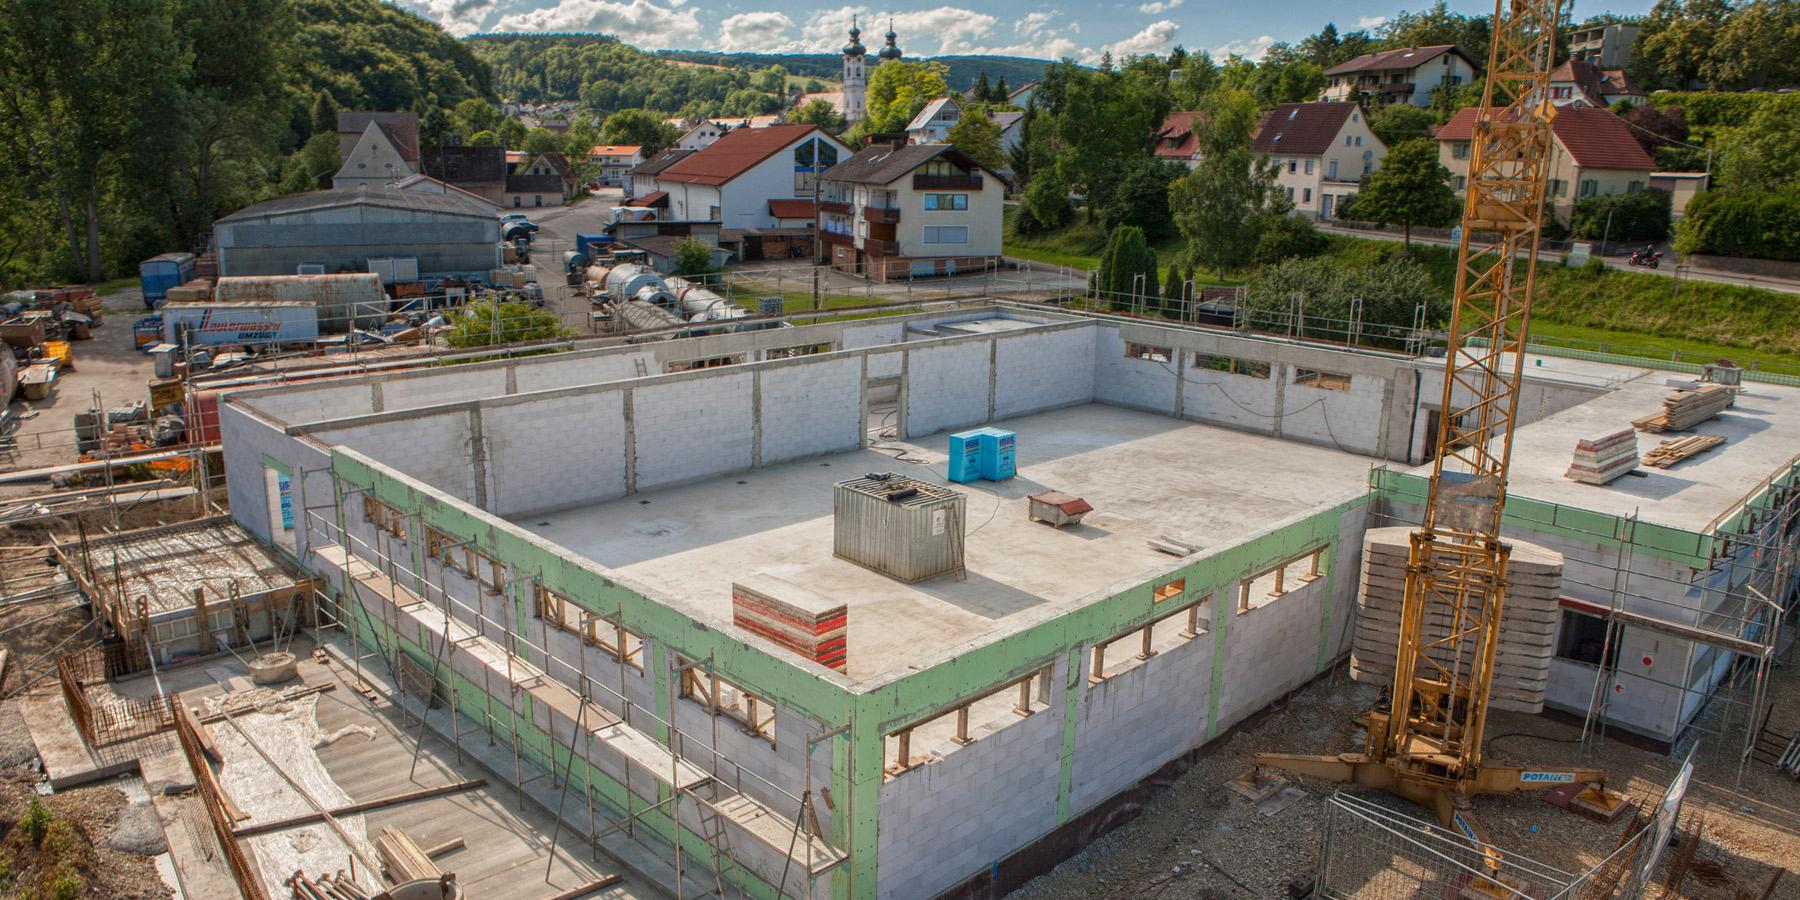 Barth Bauunternehmen